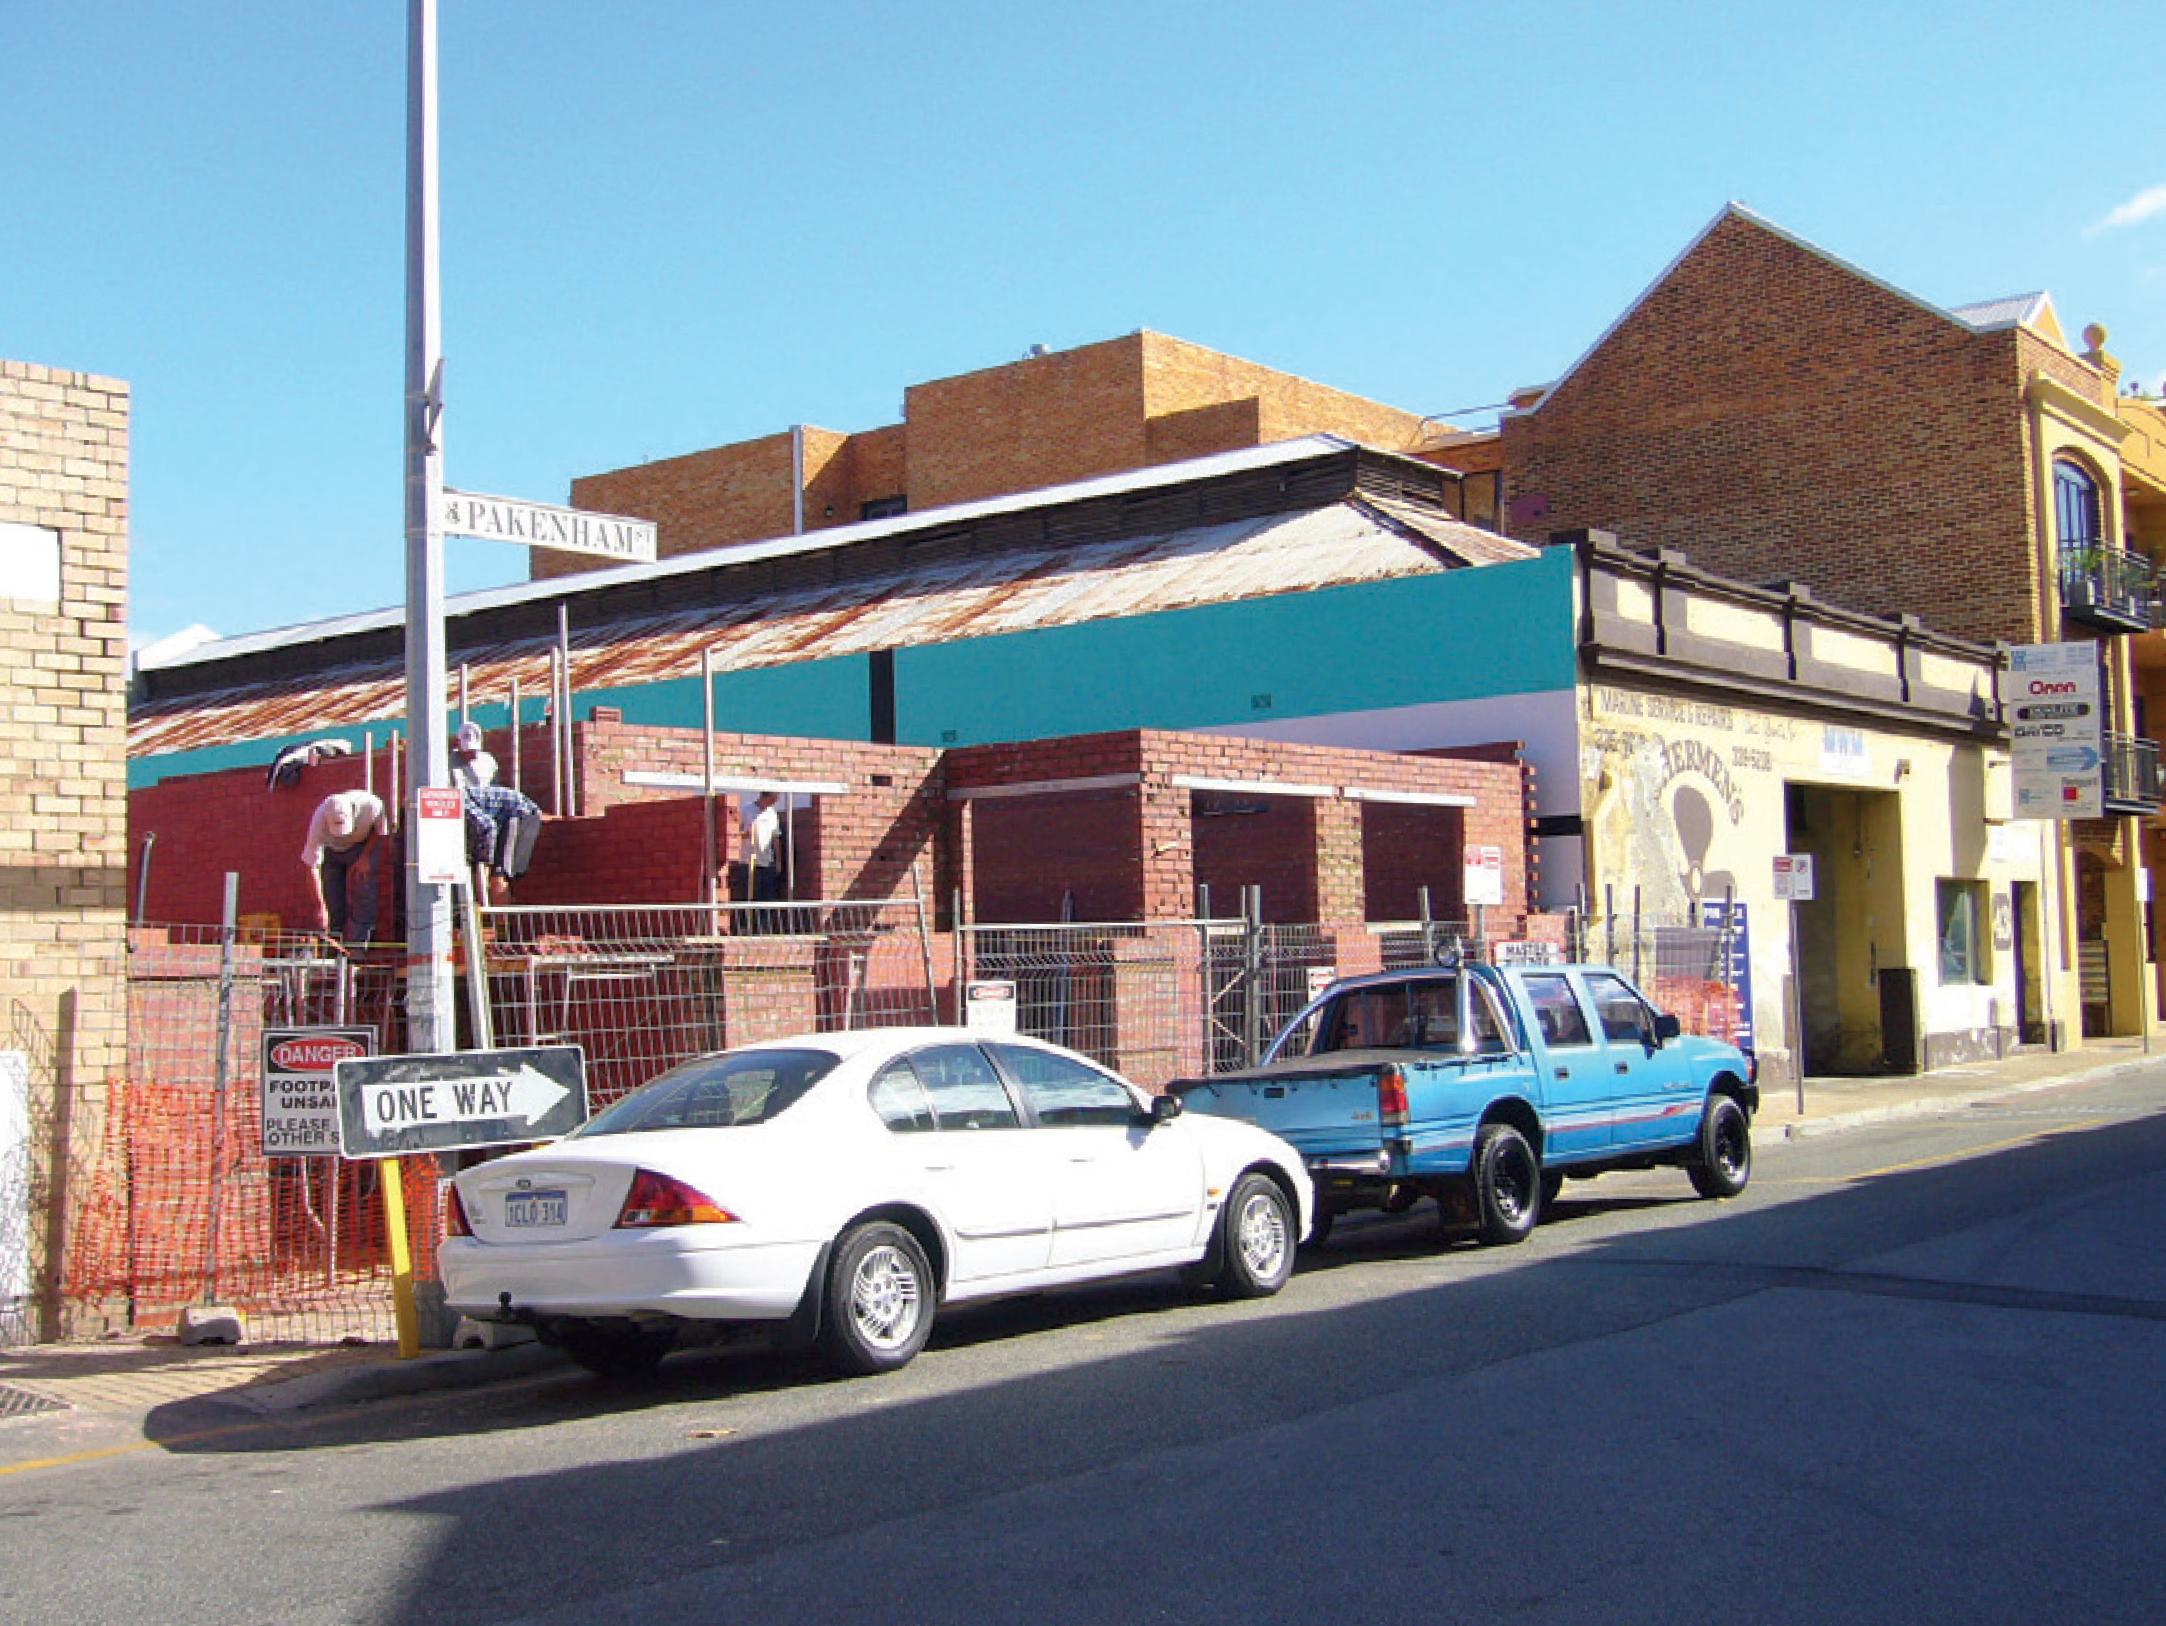 Daniel Göttin, Project 8, 2004–2008, Pakenham St Fremantle